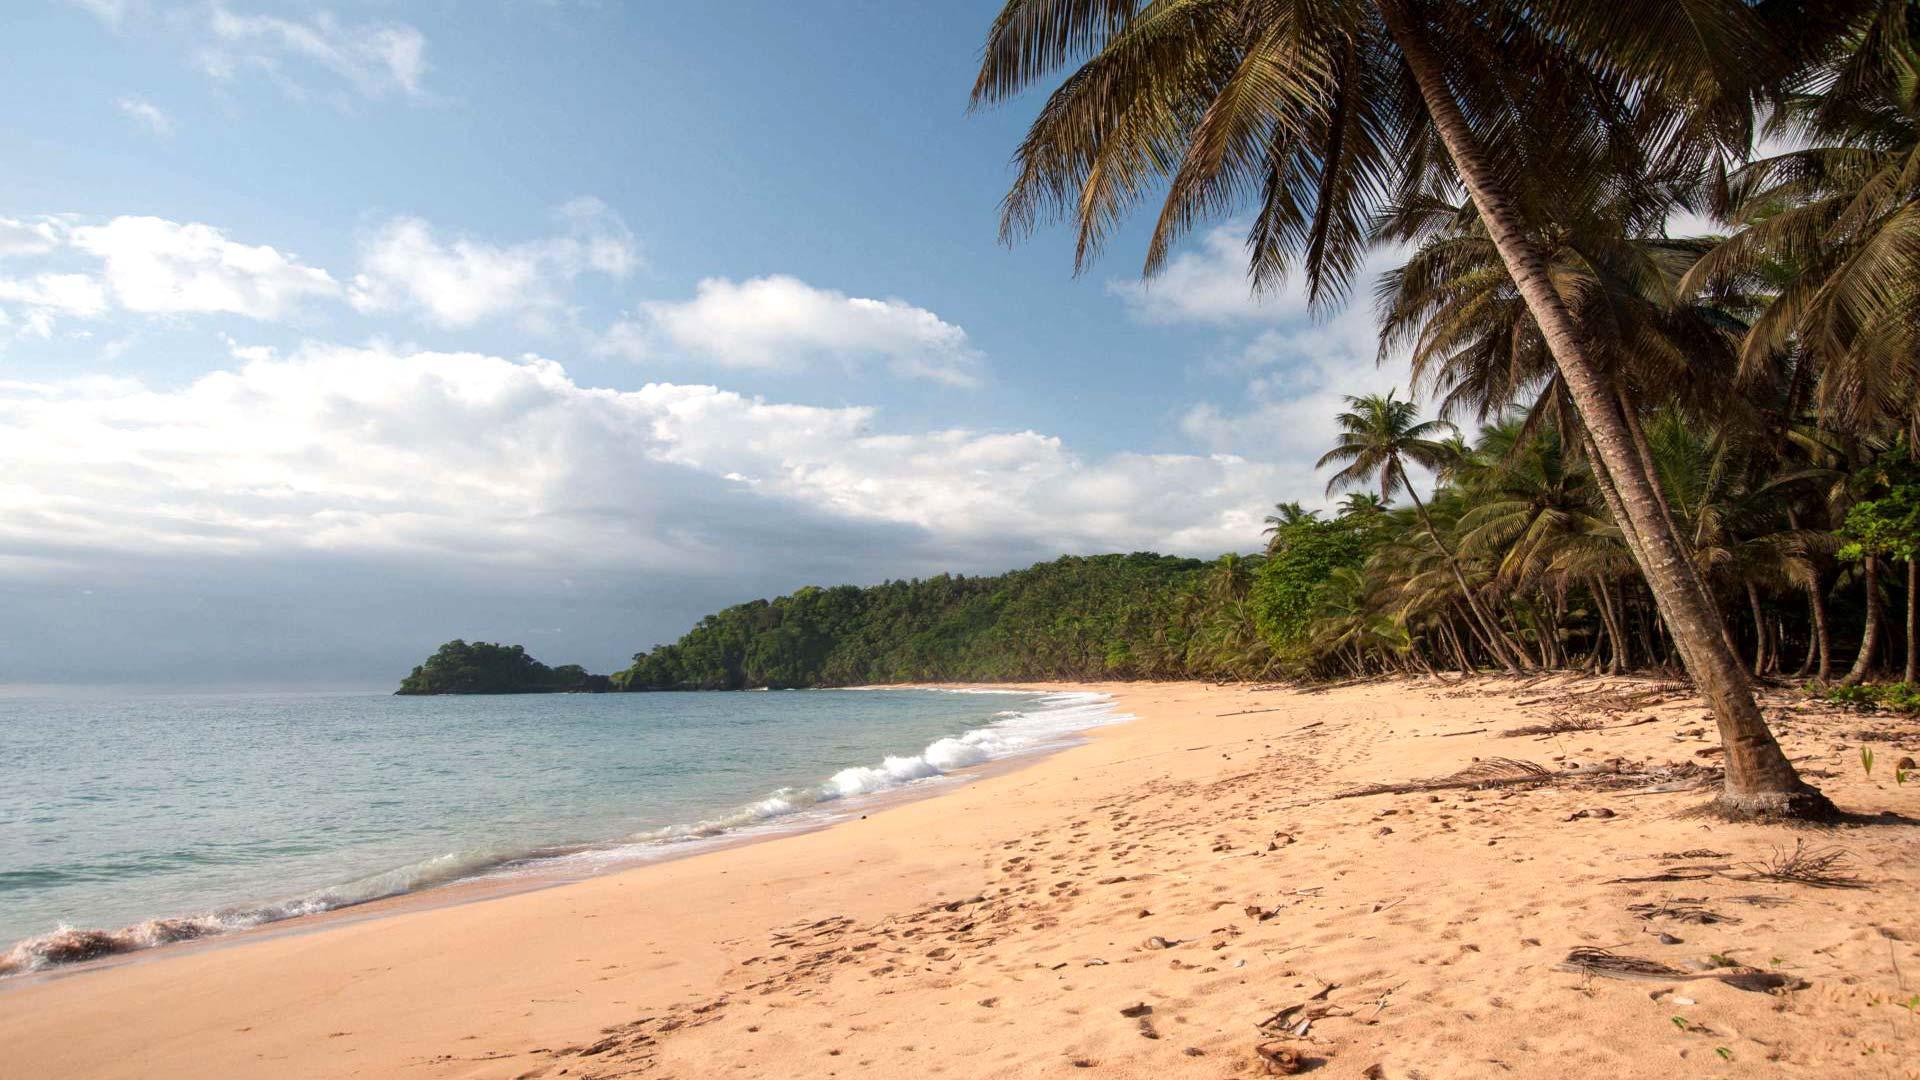 Praia Coco, Praia Santa Rita, Praia Banana, Praia das Burras, Praia Macaco et Praia Boi: petites plages isolées entre végétation luxuriante et le bleu d'une mer calme sur l'île de Principe